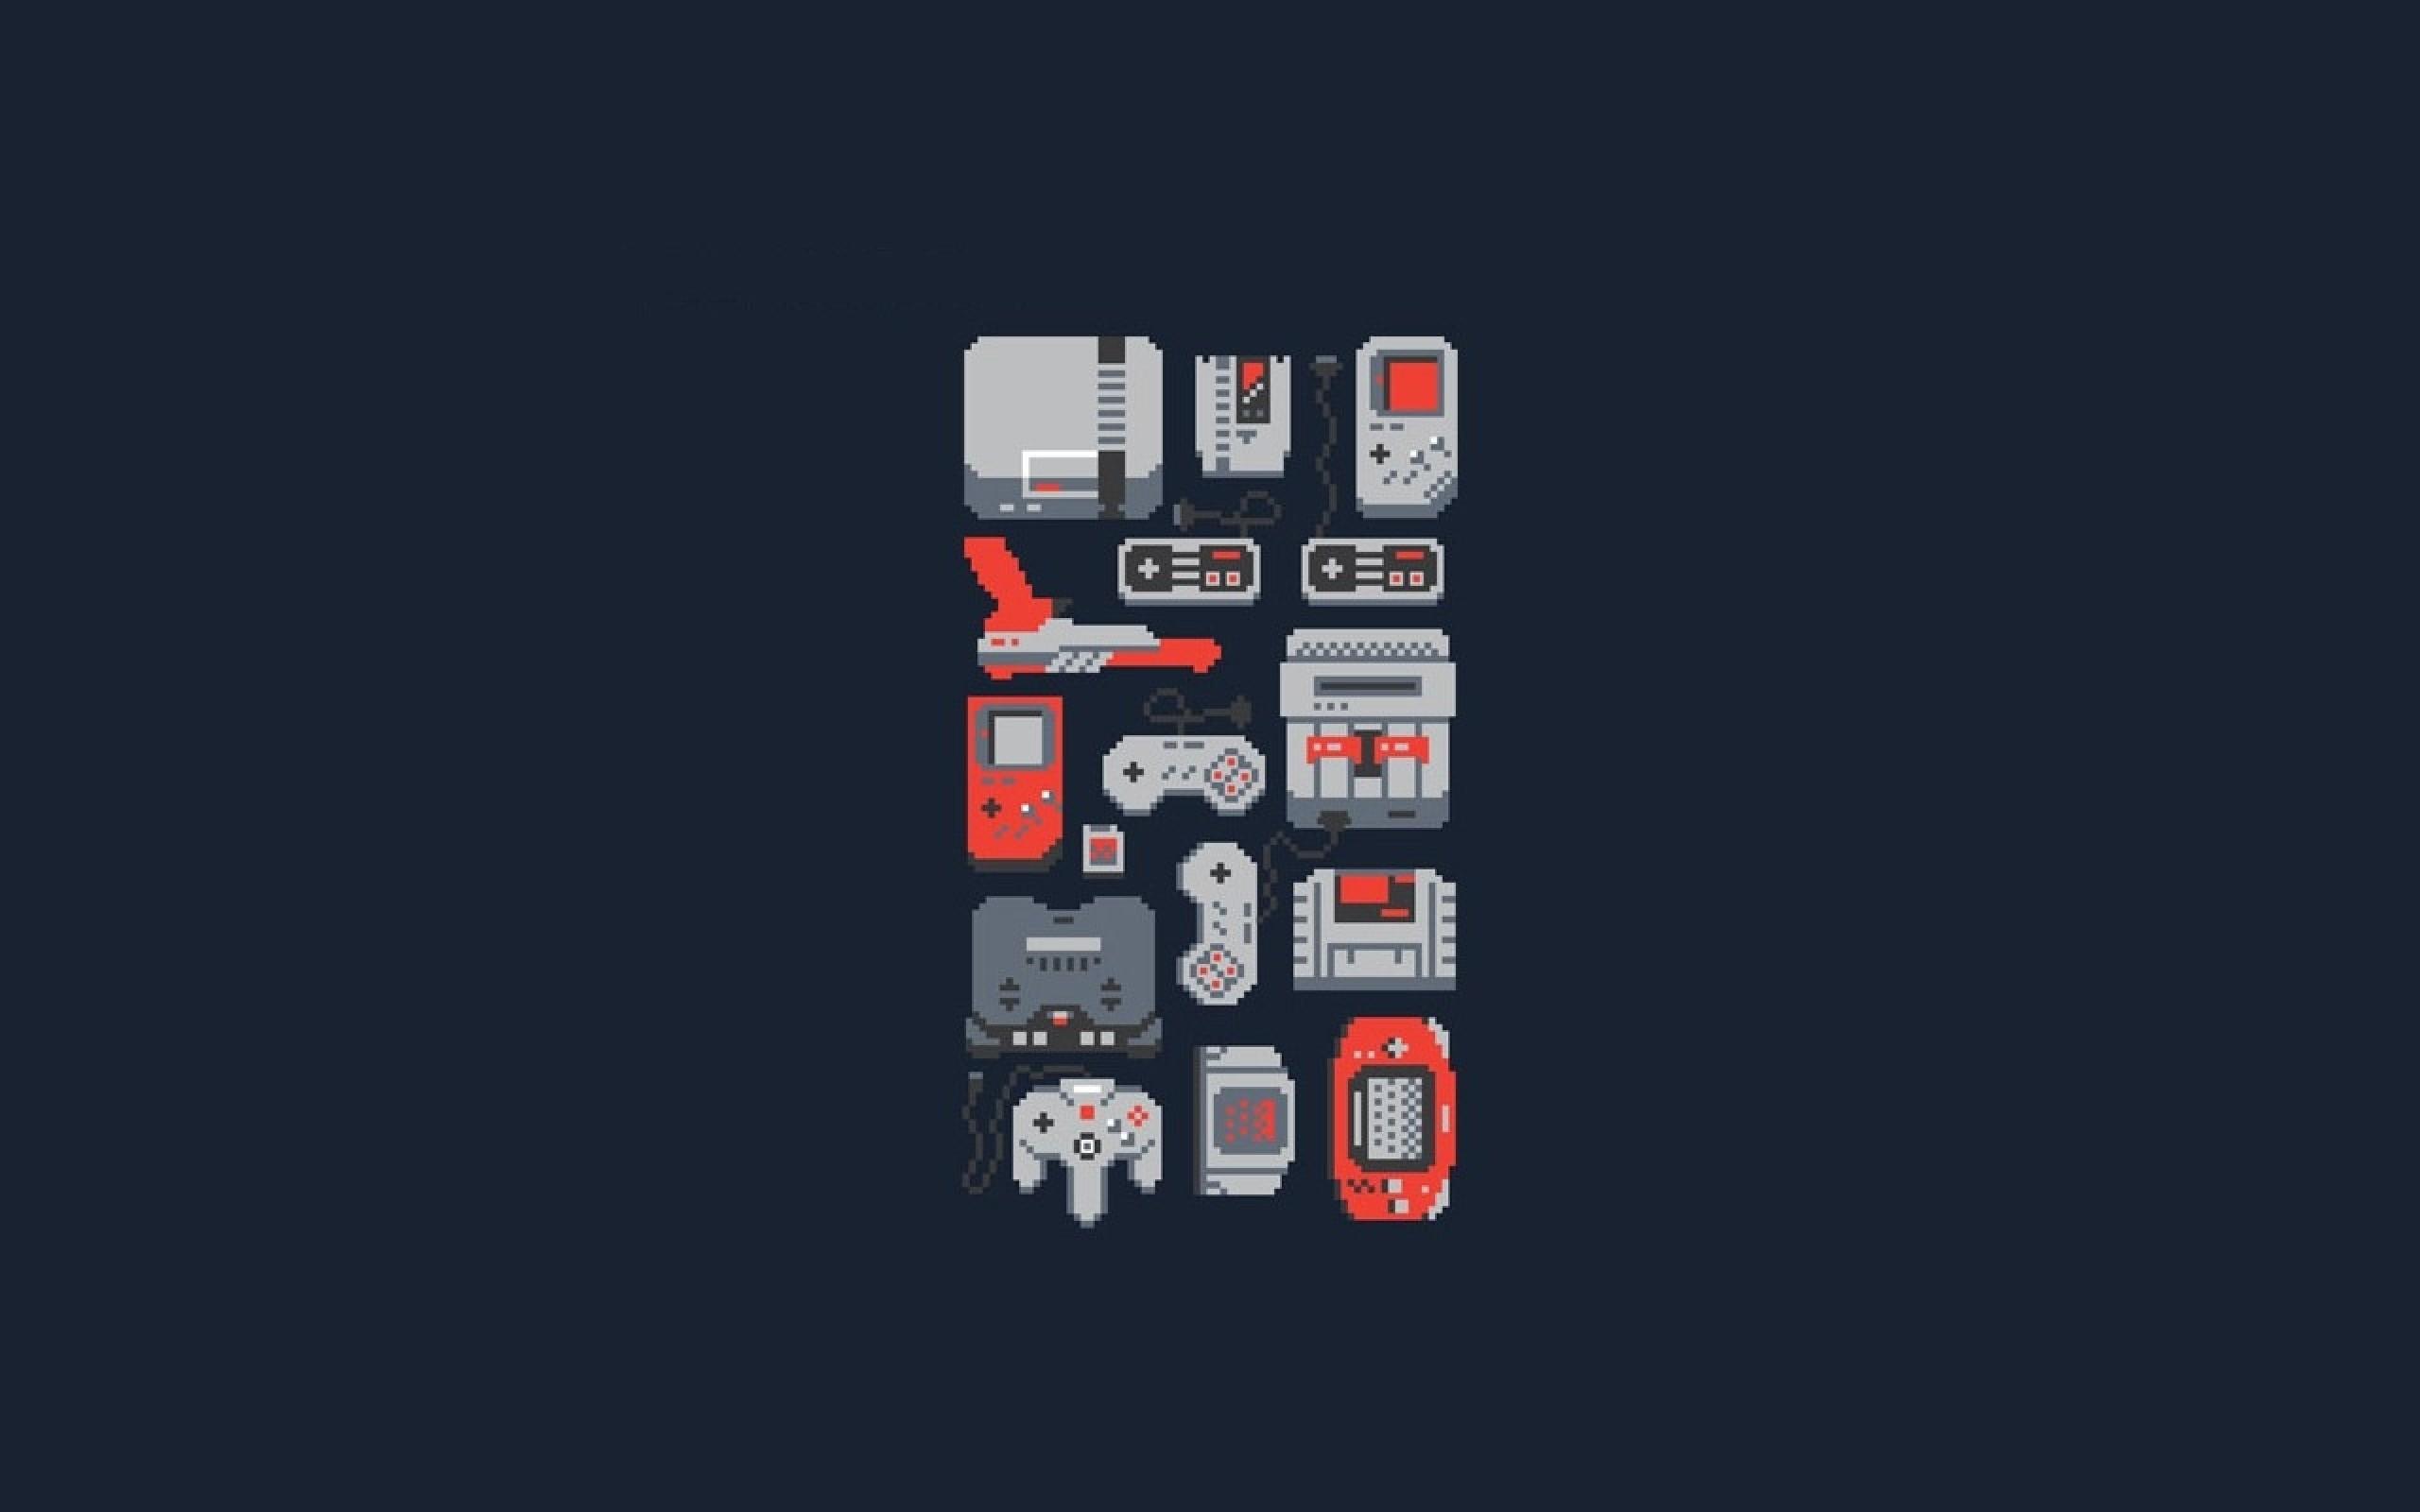 8 Bit Hd Video Game Wallpapers